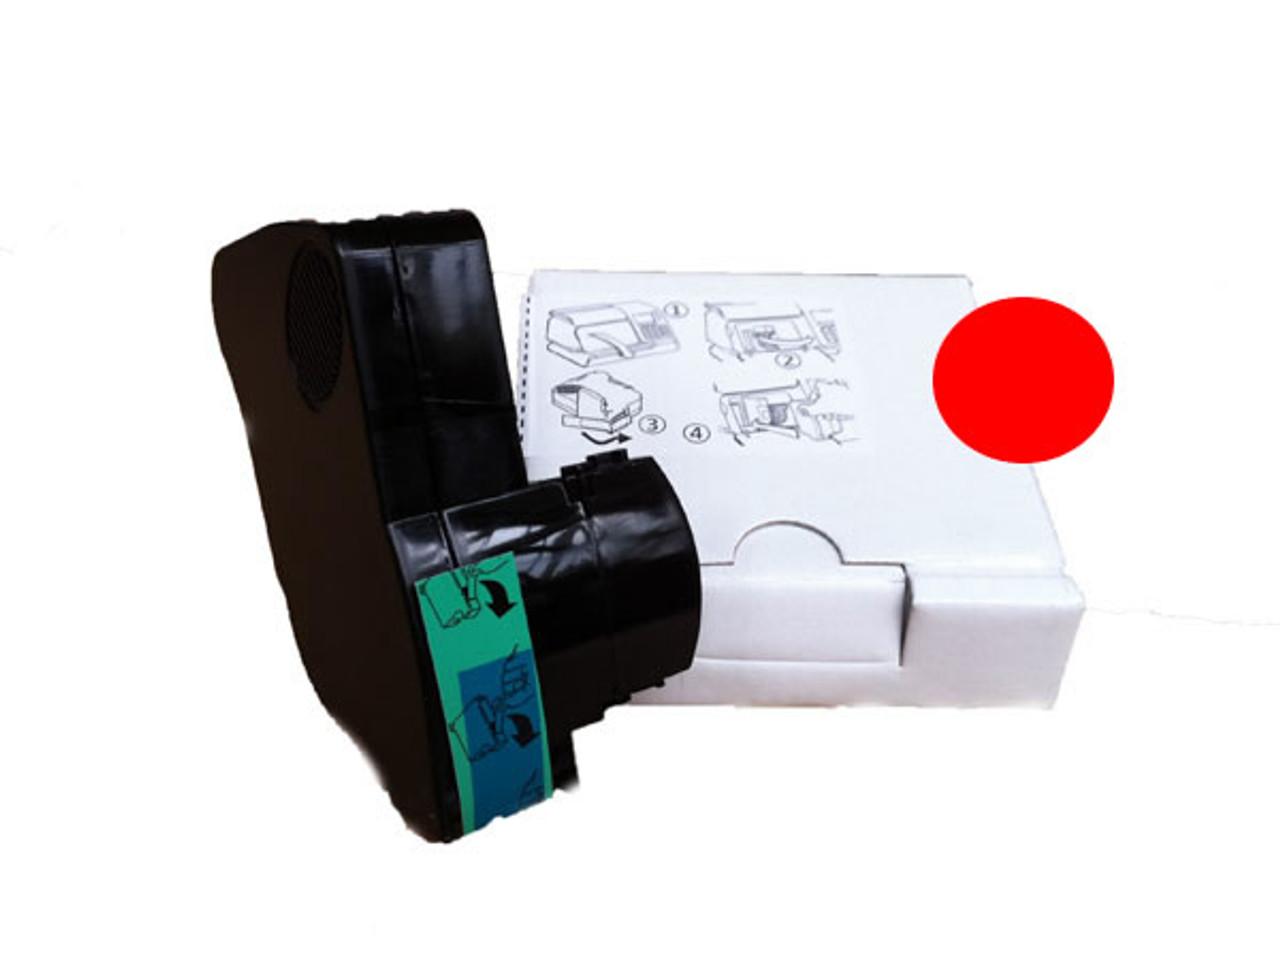 Original Neopost IJ25 Franking Ink Cartridge 70401 300206